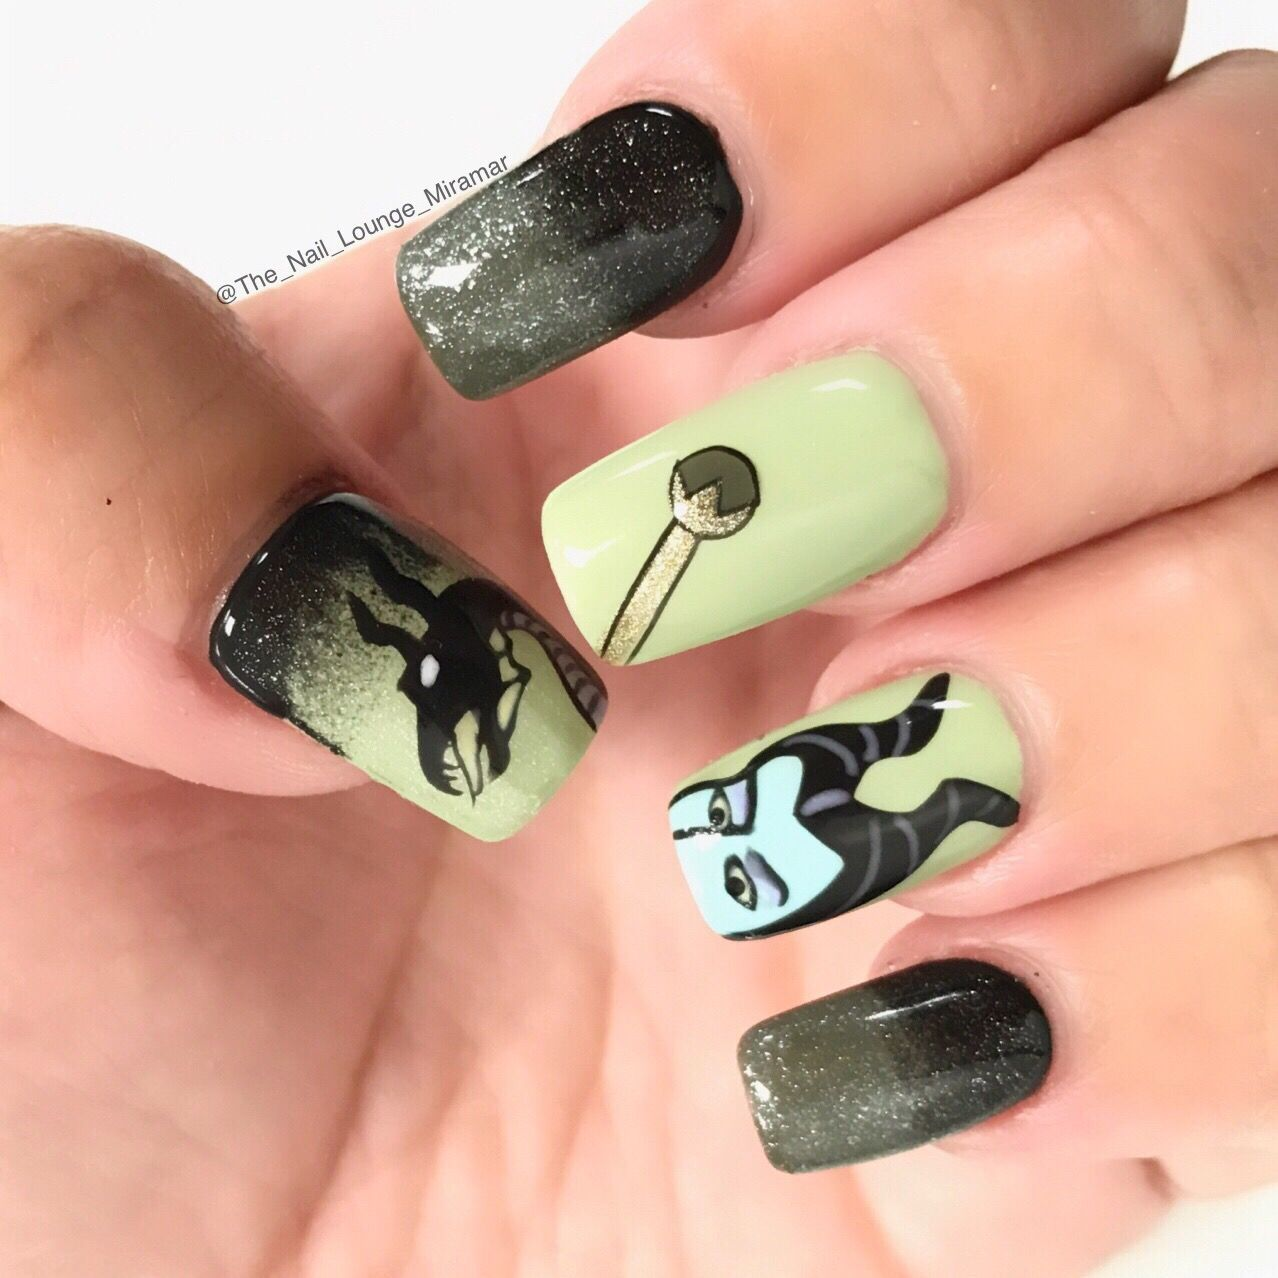 Maleficent nail art design | Nail Art | Pinterest | Maleficent nails ...